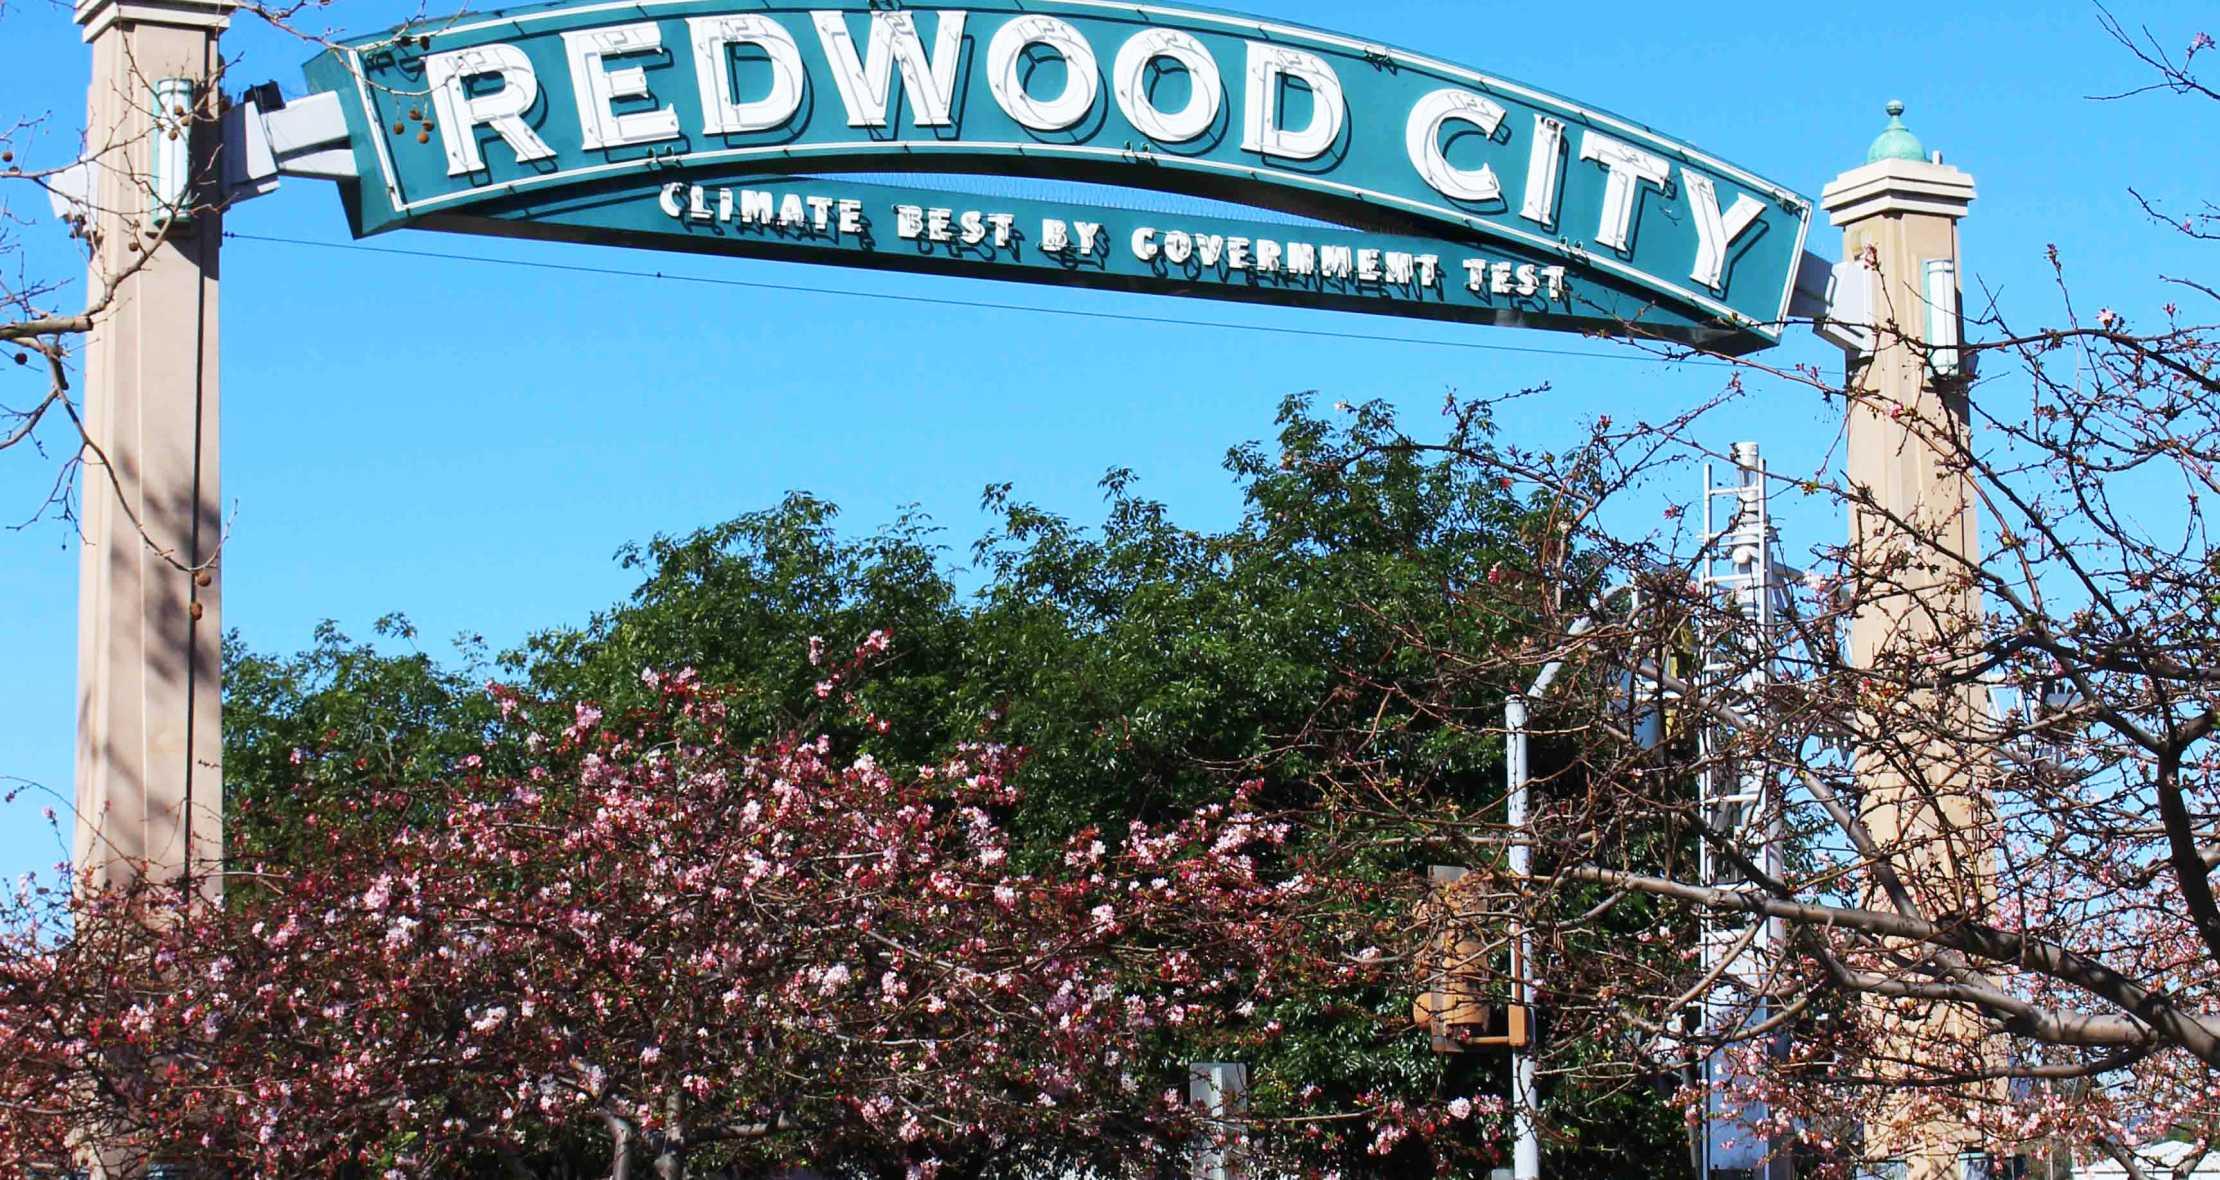 Redwood city Backflow Testing - Backflow Testing Redwood City